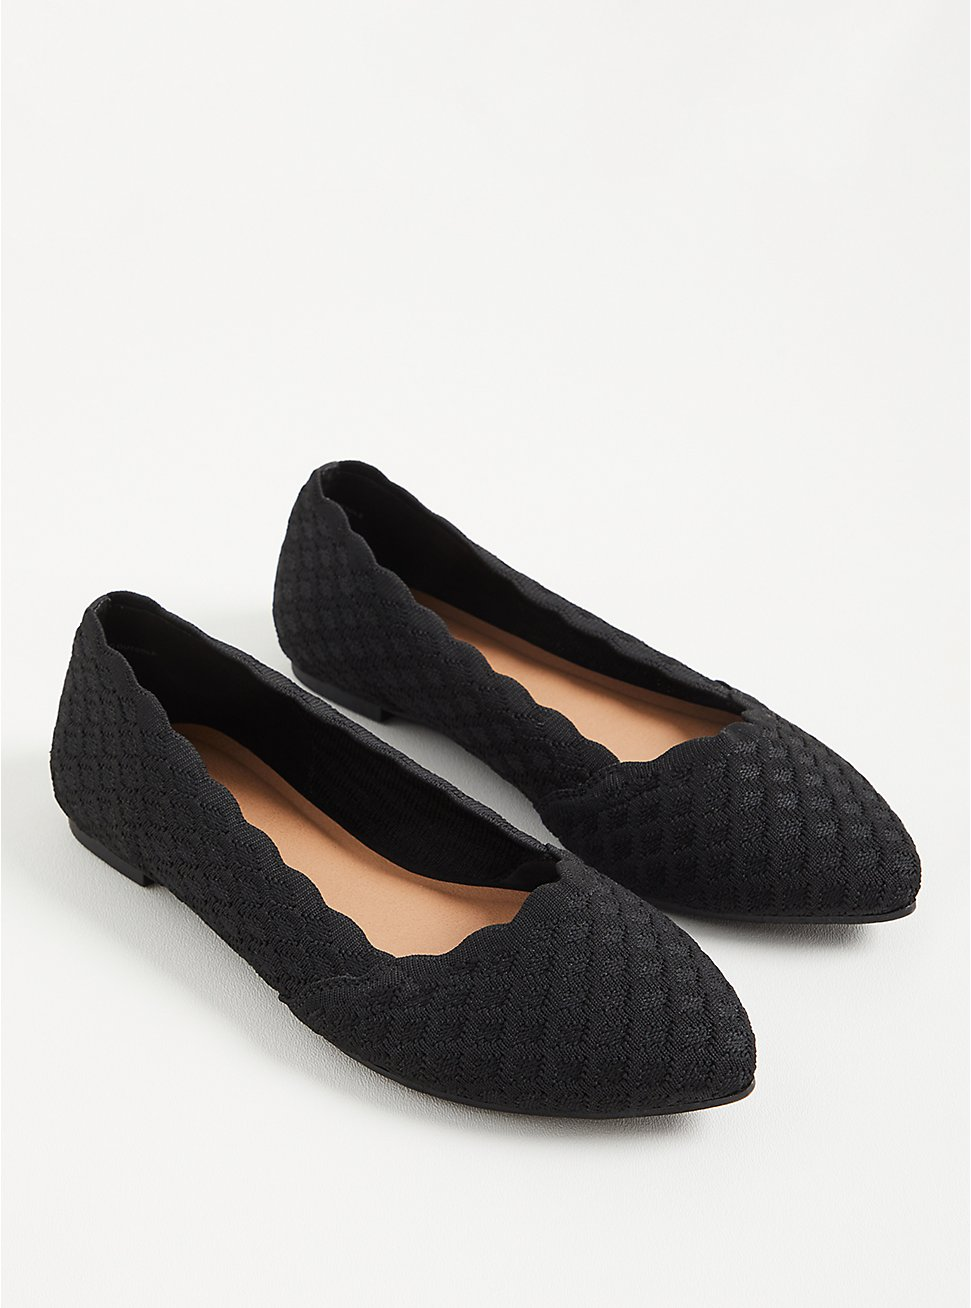 Pointed Toe Flat - Black Stretch Knit (WW), BLACK, hi-res